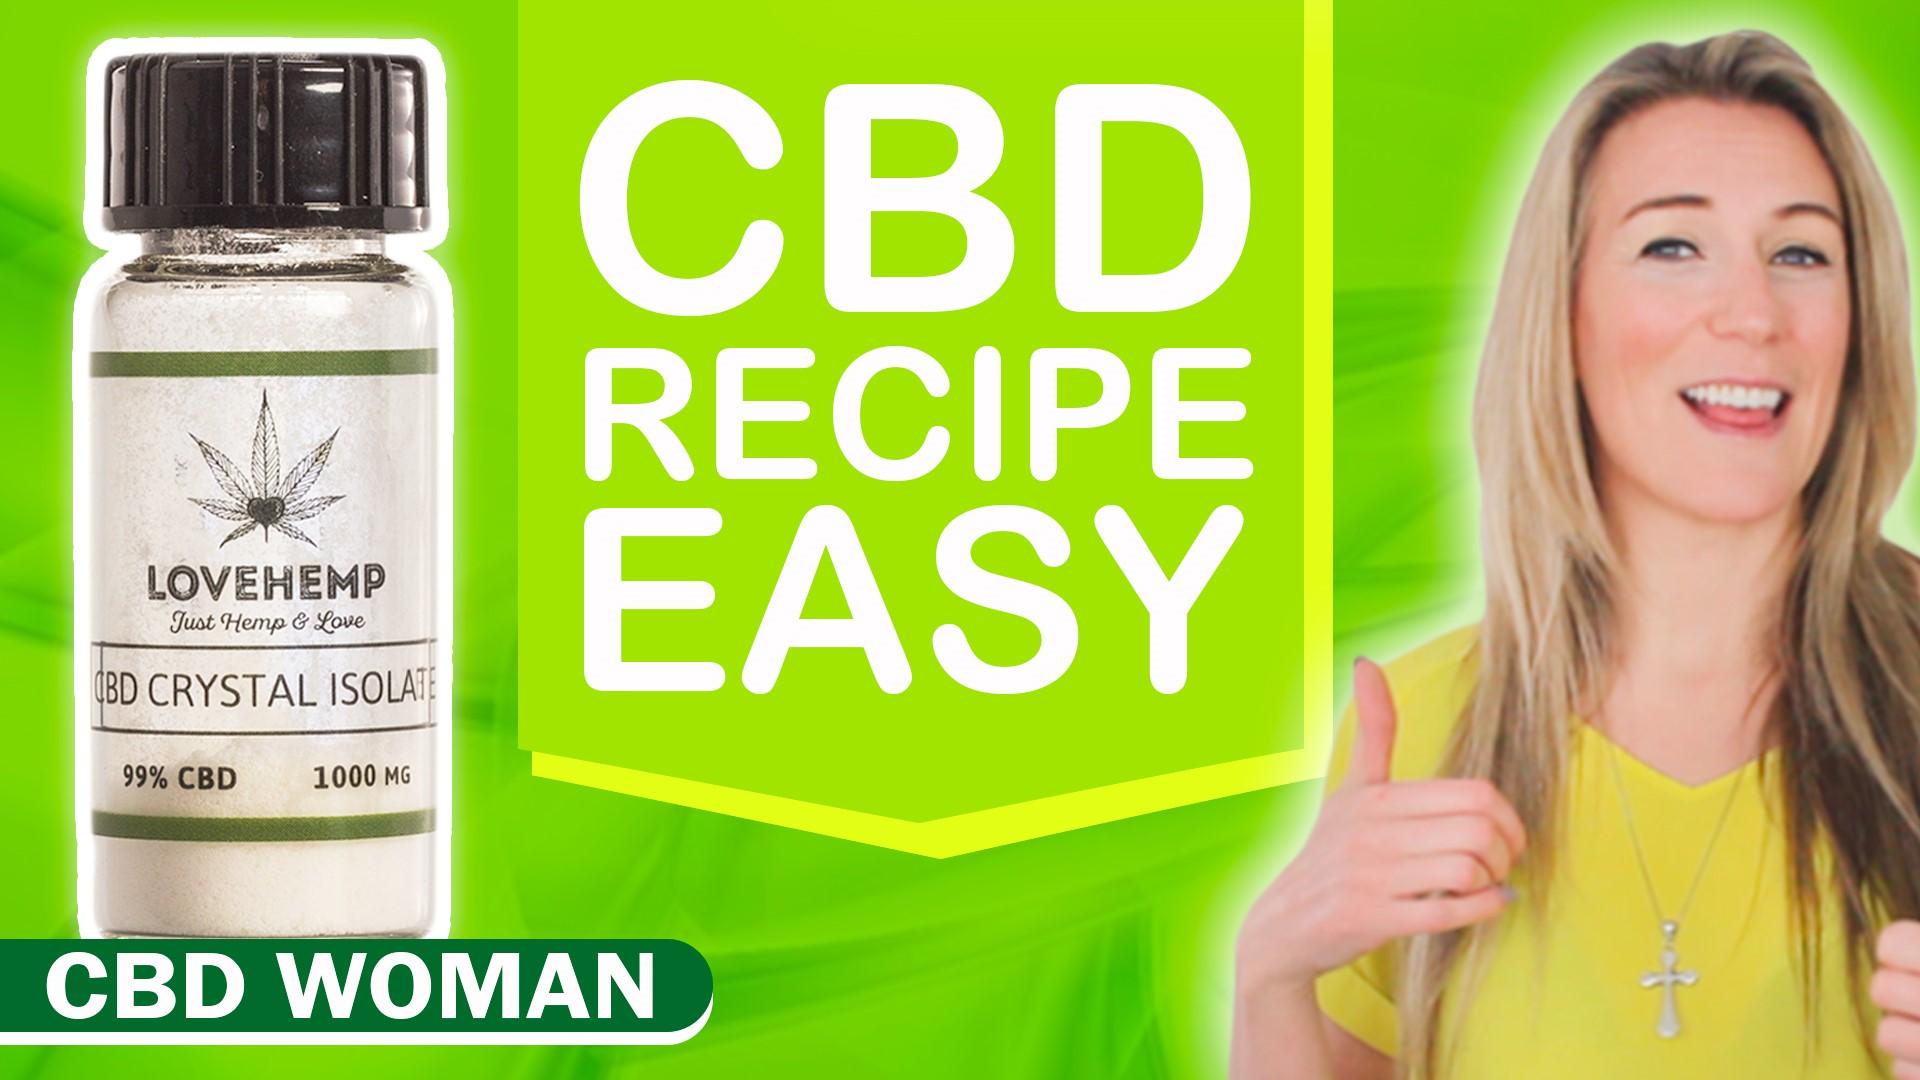 How to Make CBD Edibles -1 Easy Recipe